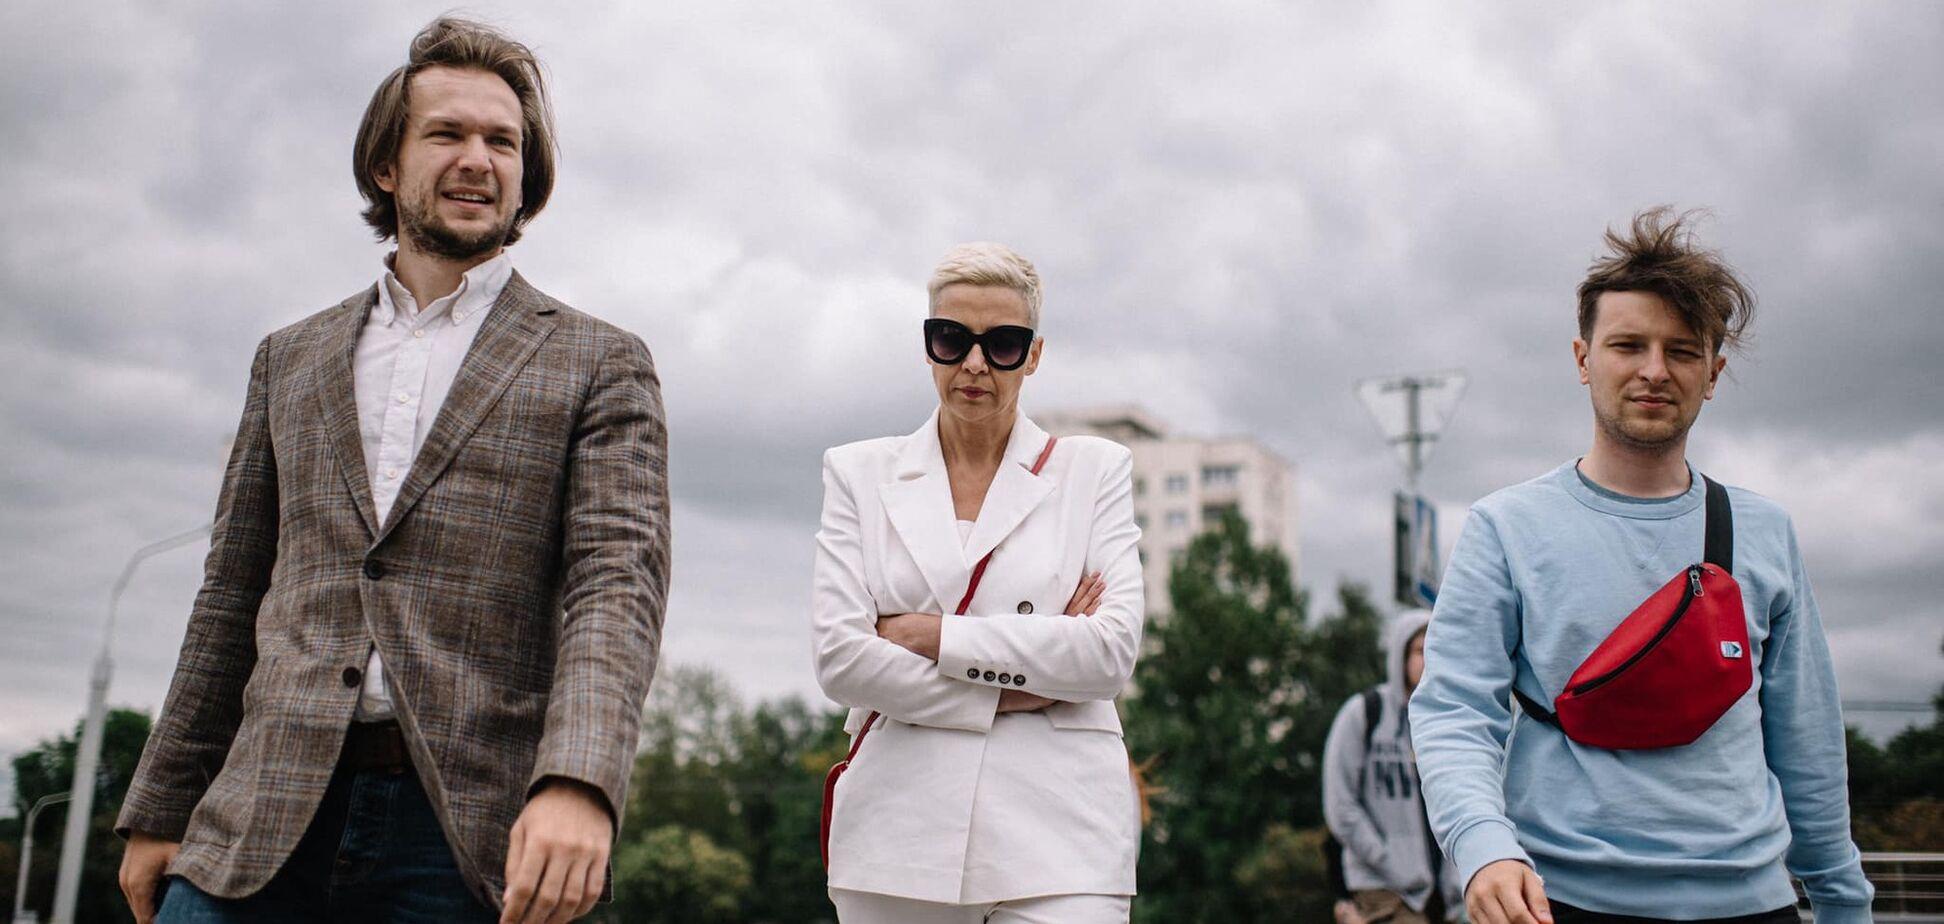 Иван Кравцов, Мария Колесникова и Антон Родненков